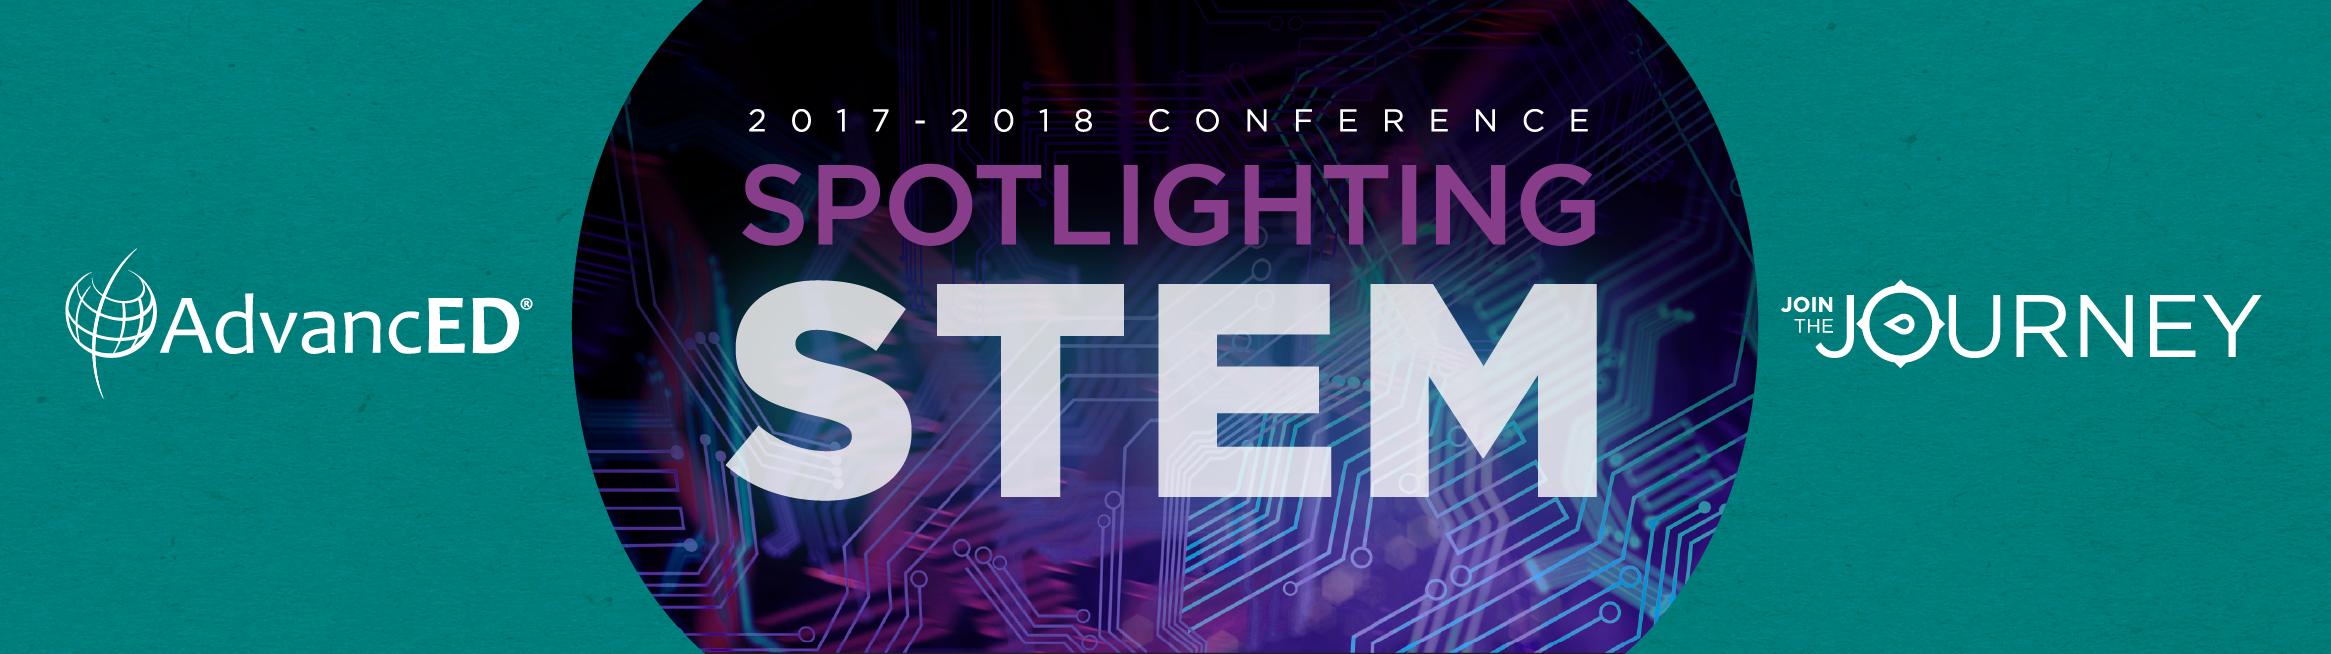 AdvancED Missouri Join the Journey: Spotlighting STEM Conference